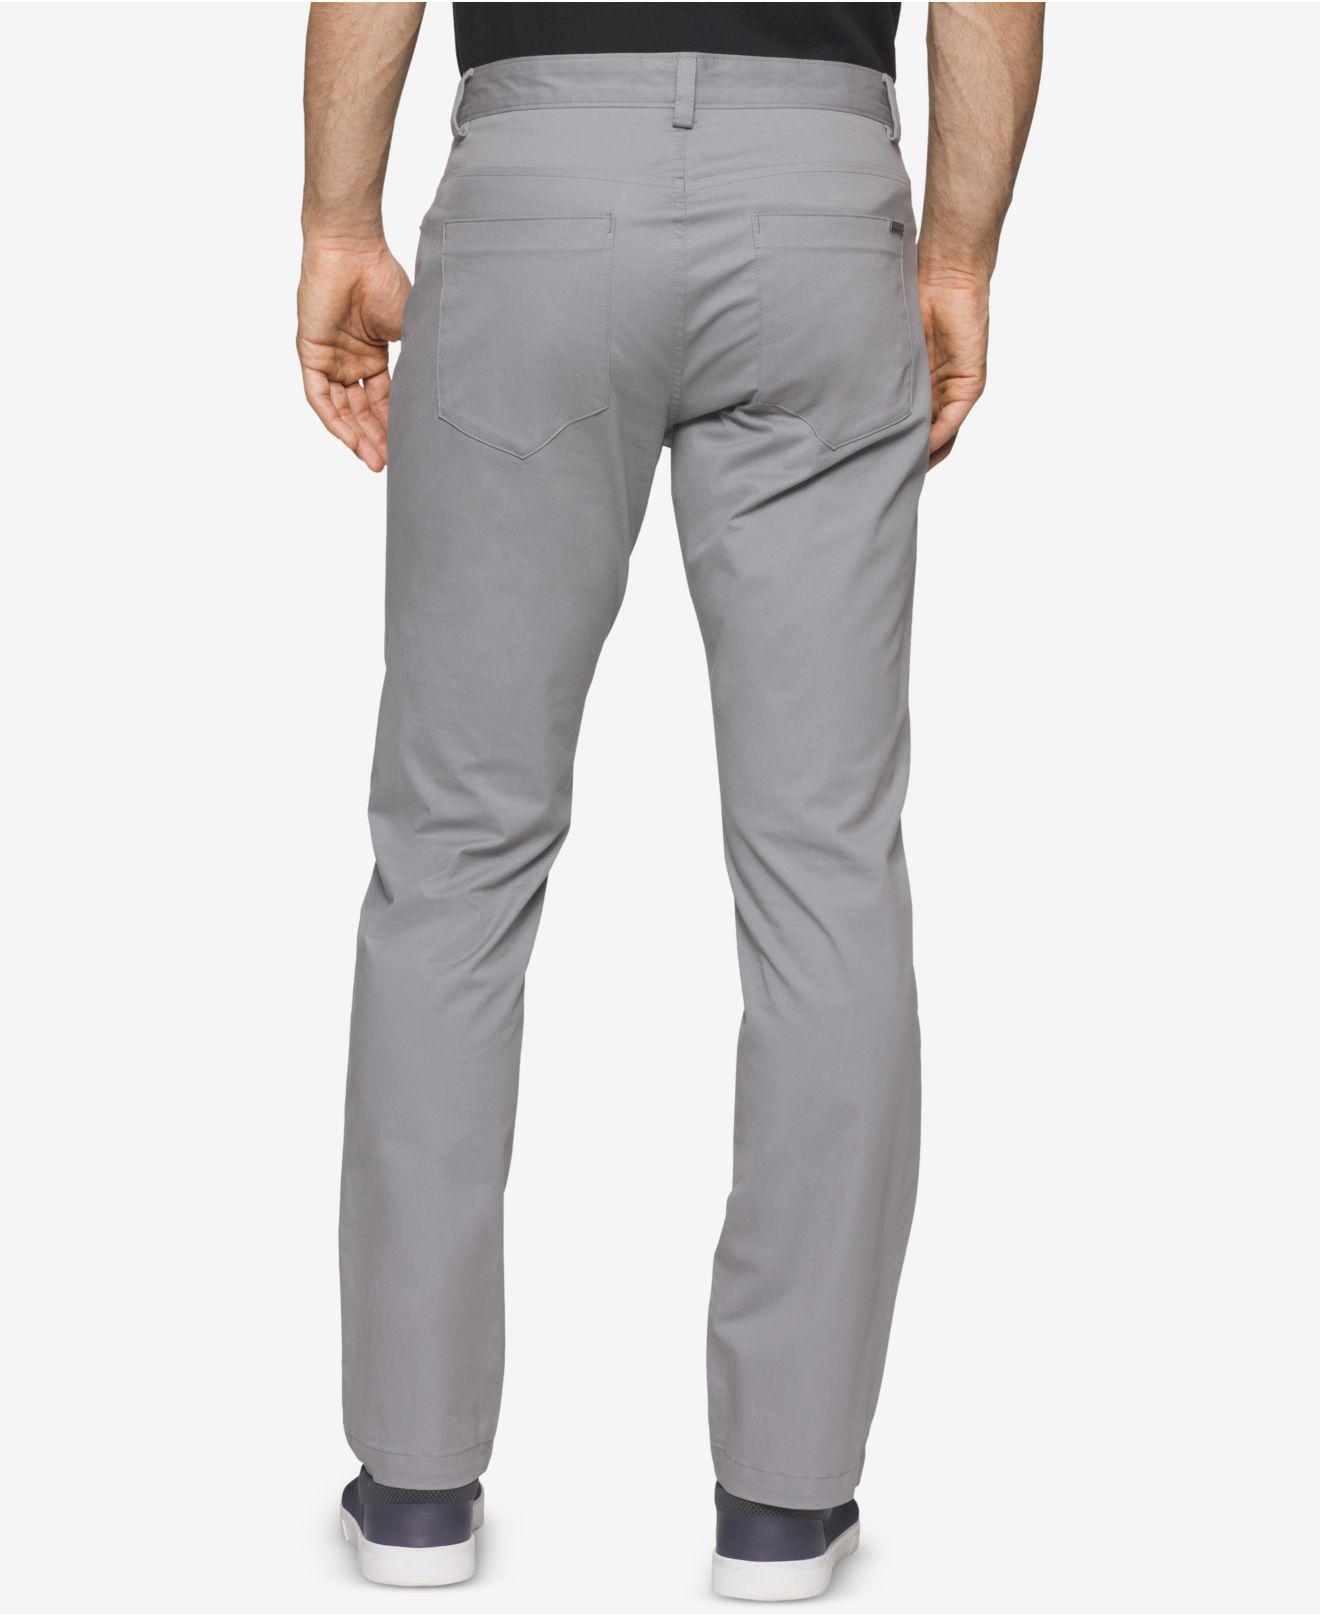 Calvin Klein Cotton Pants Sateen Slim Fit Pants In Gray